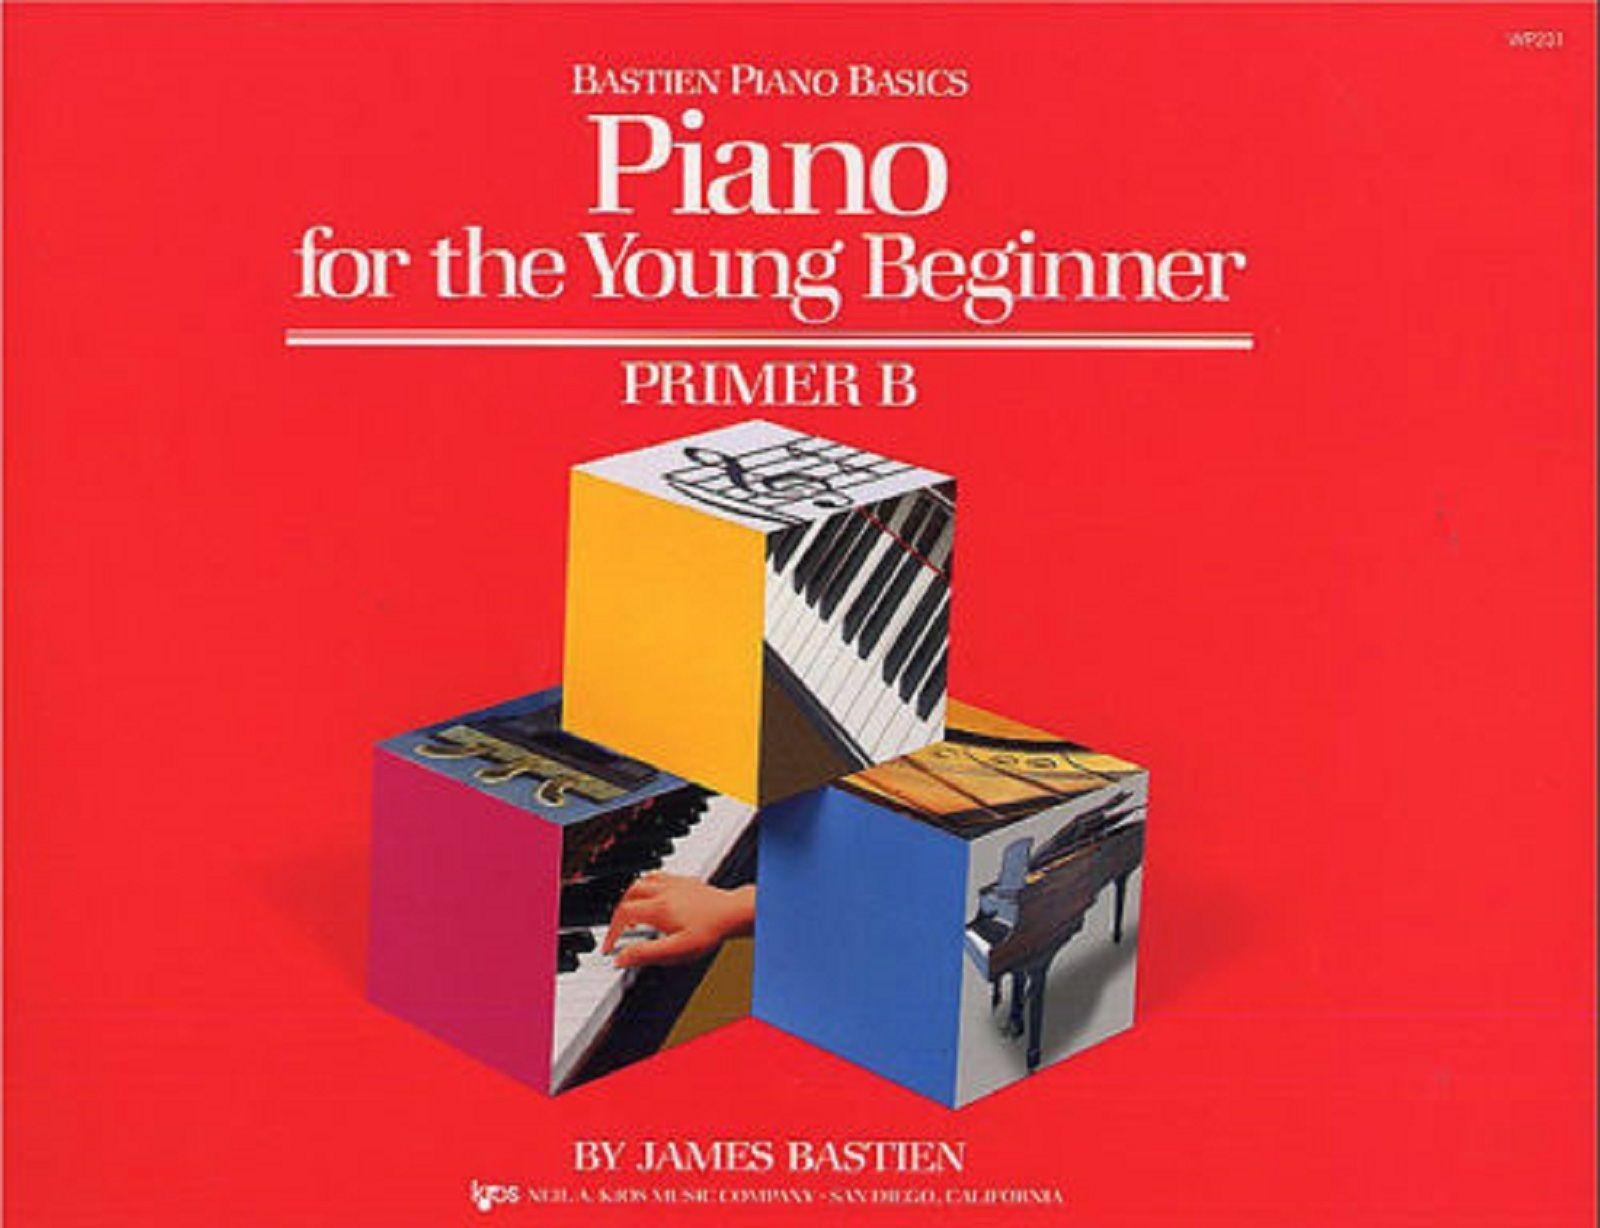 Bastien Piano Basics For The Young Beginner Primer B Tutor Book Progressive S171